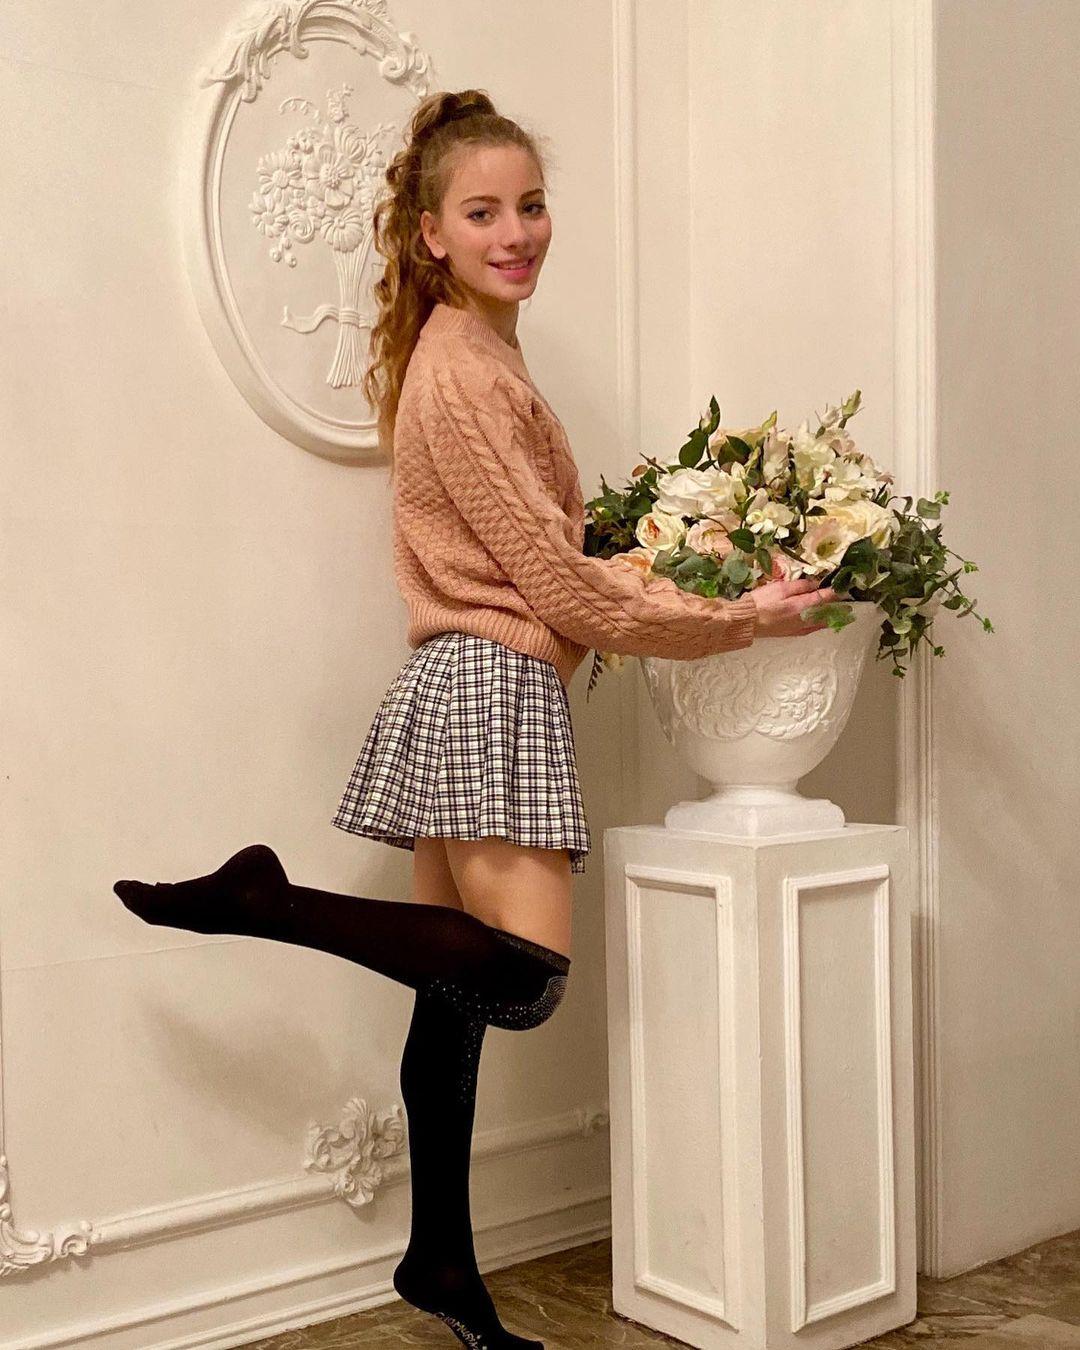 Anna-Gloss-Wallpapers-Insta-Fit-Bio-5